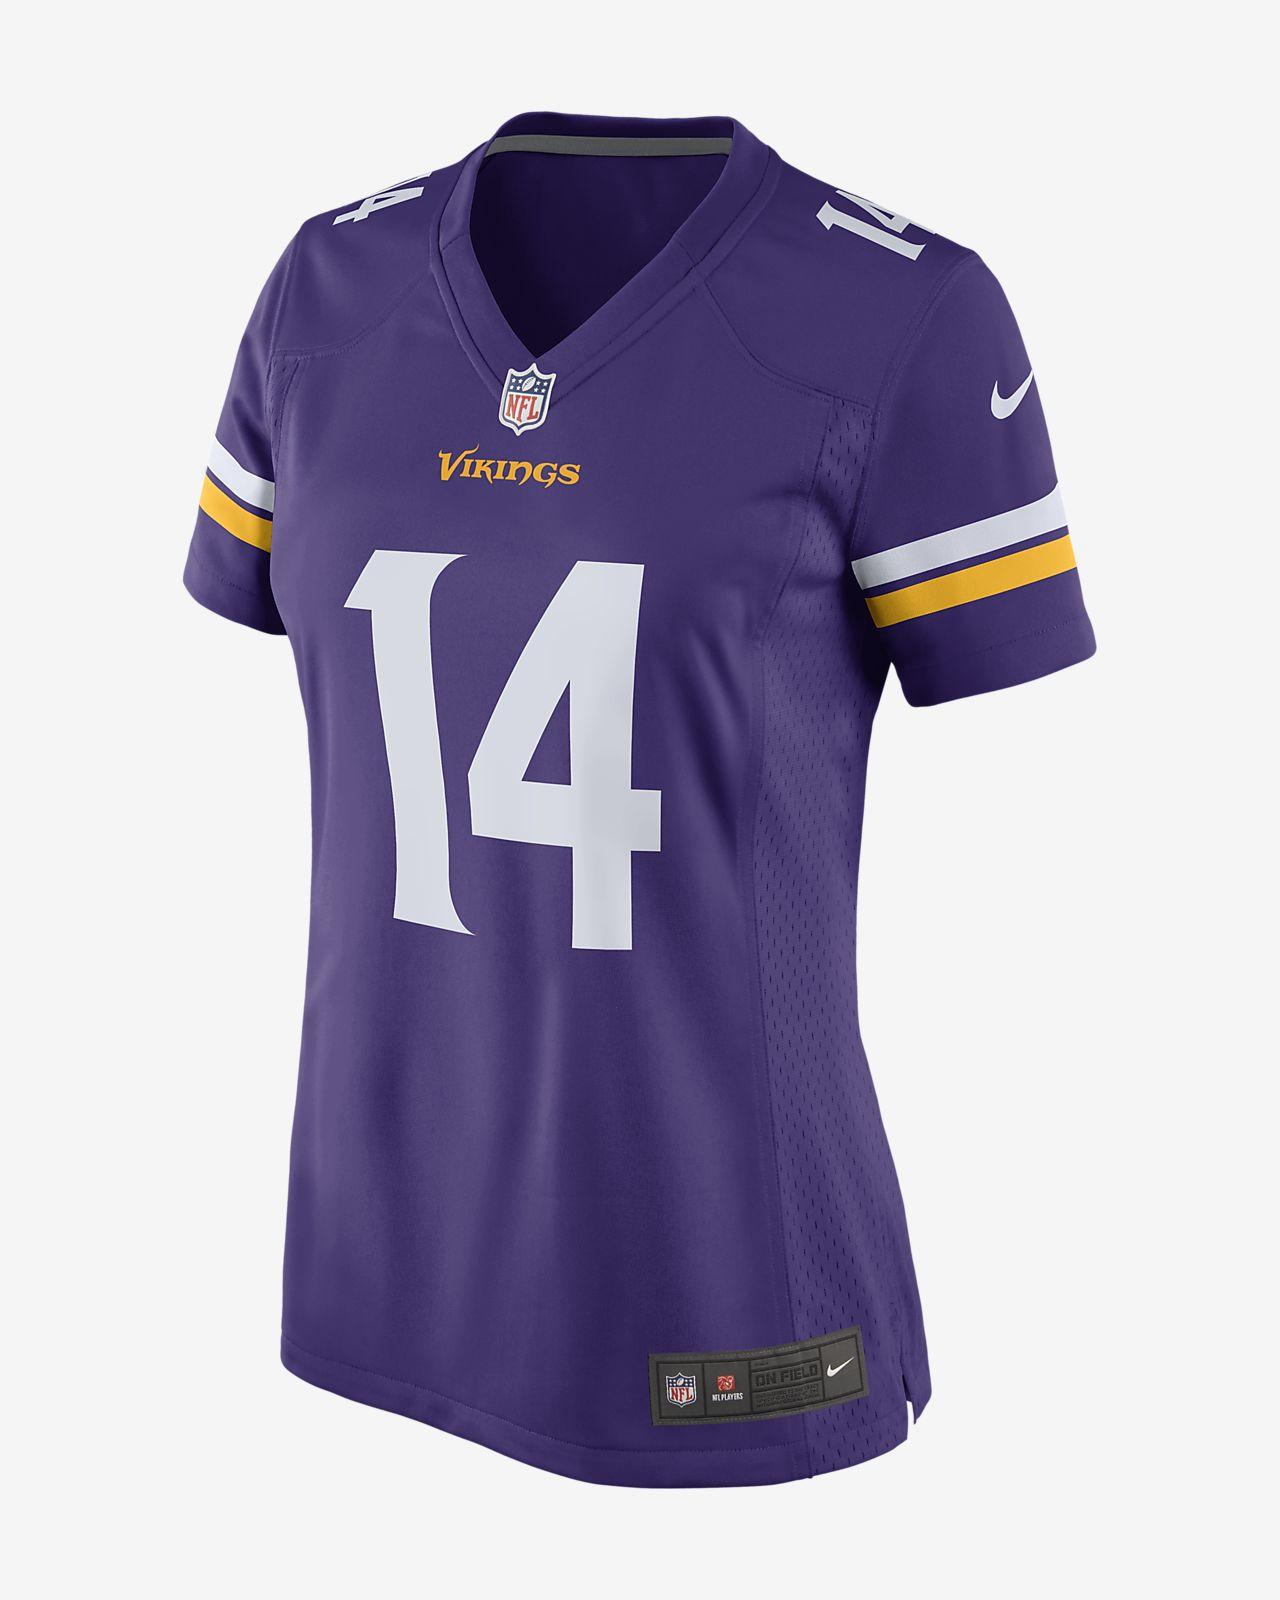 6dbdf7c0f NFL Minnesota Vikings Game (Stefon Diggs) Women s Football Jersey ...